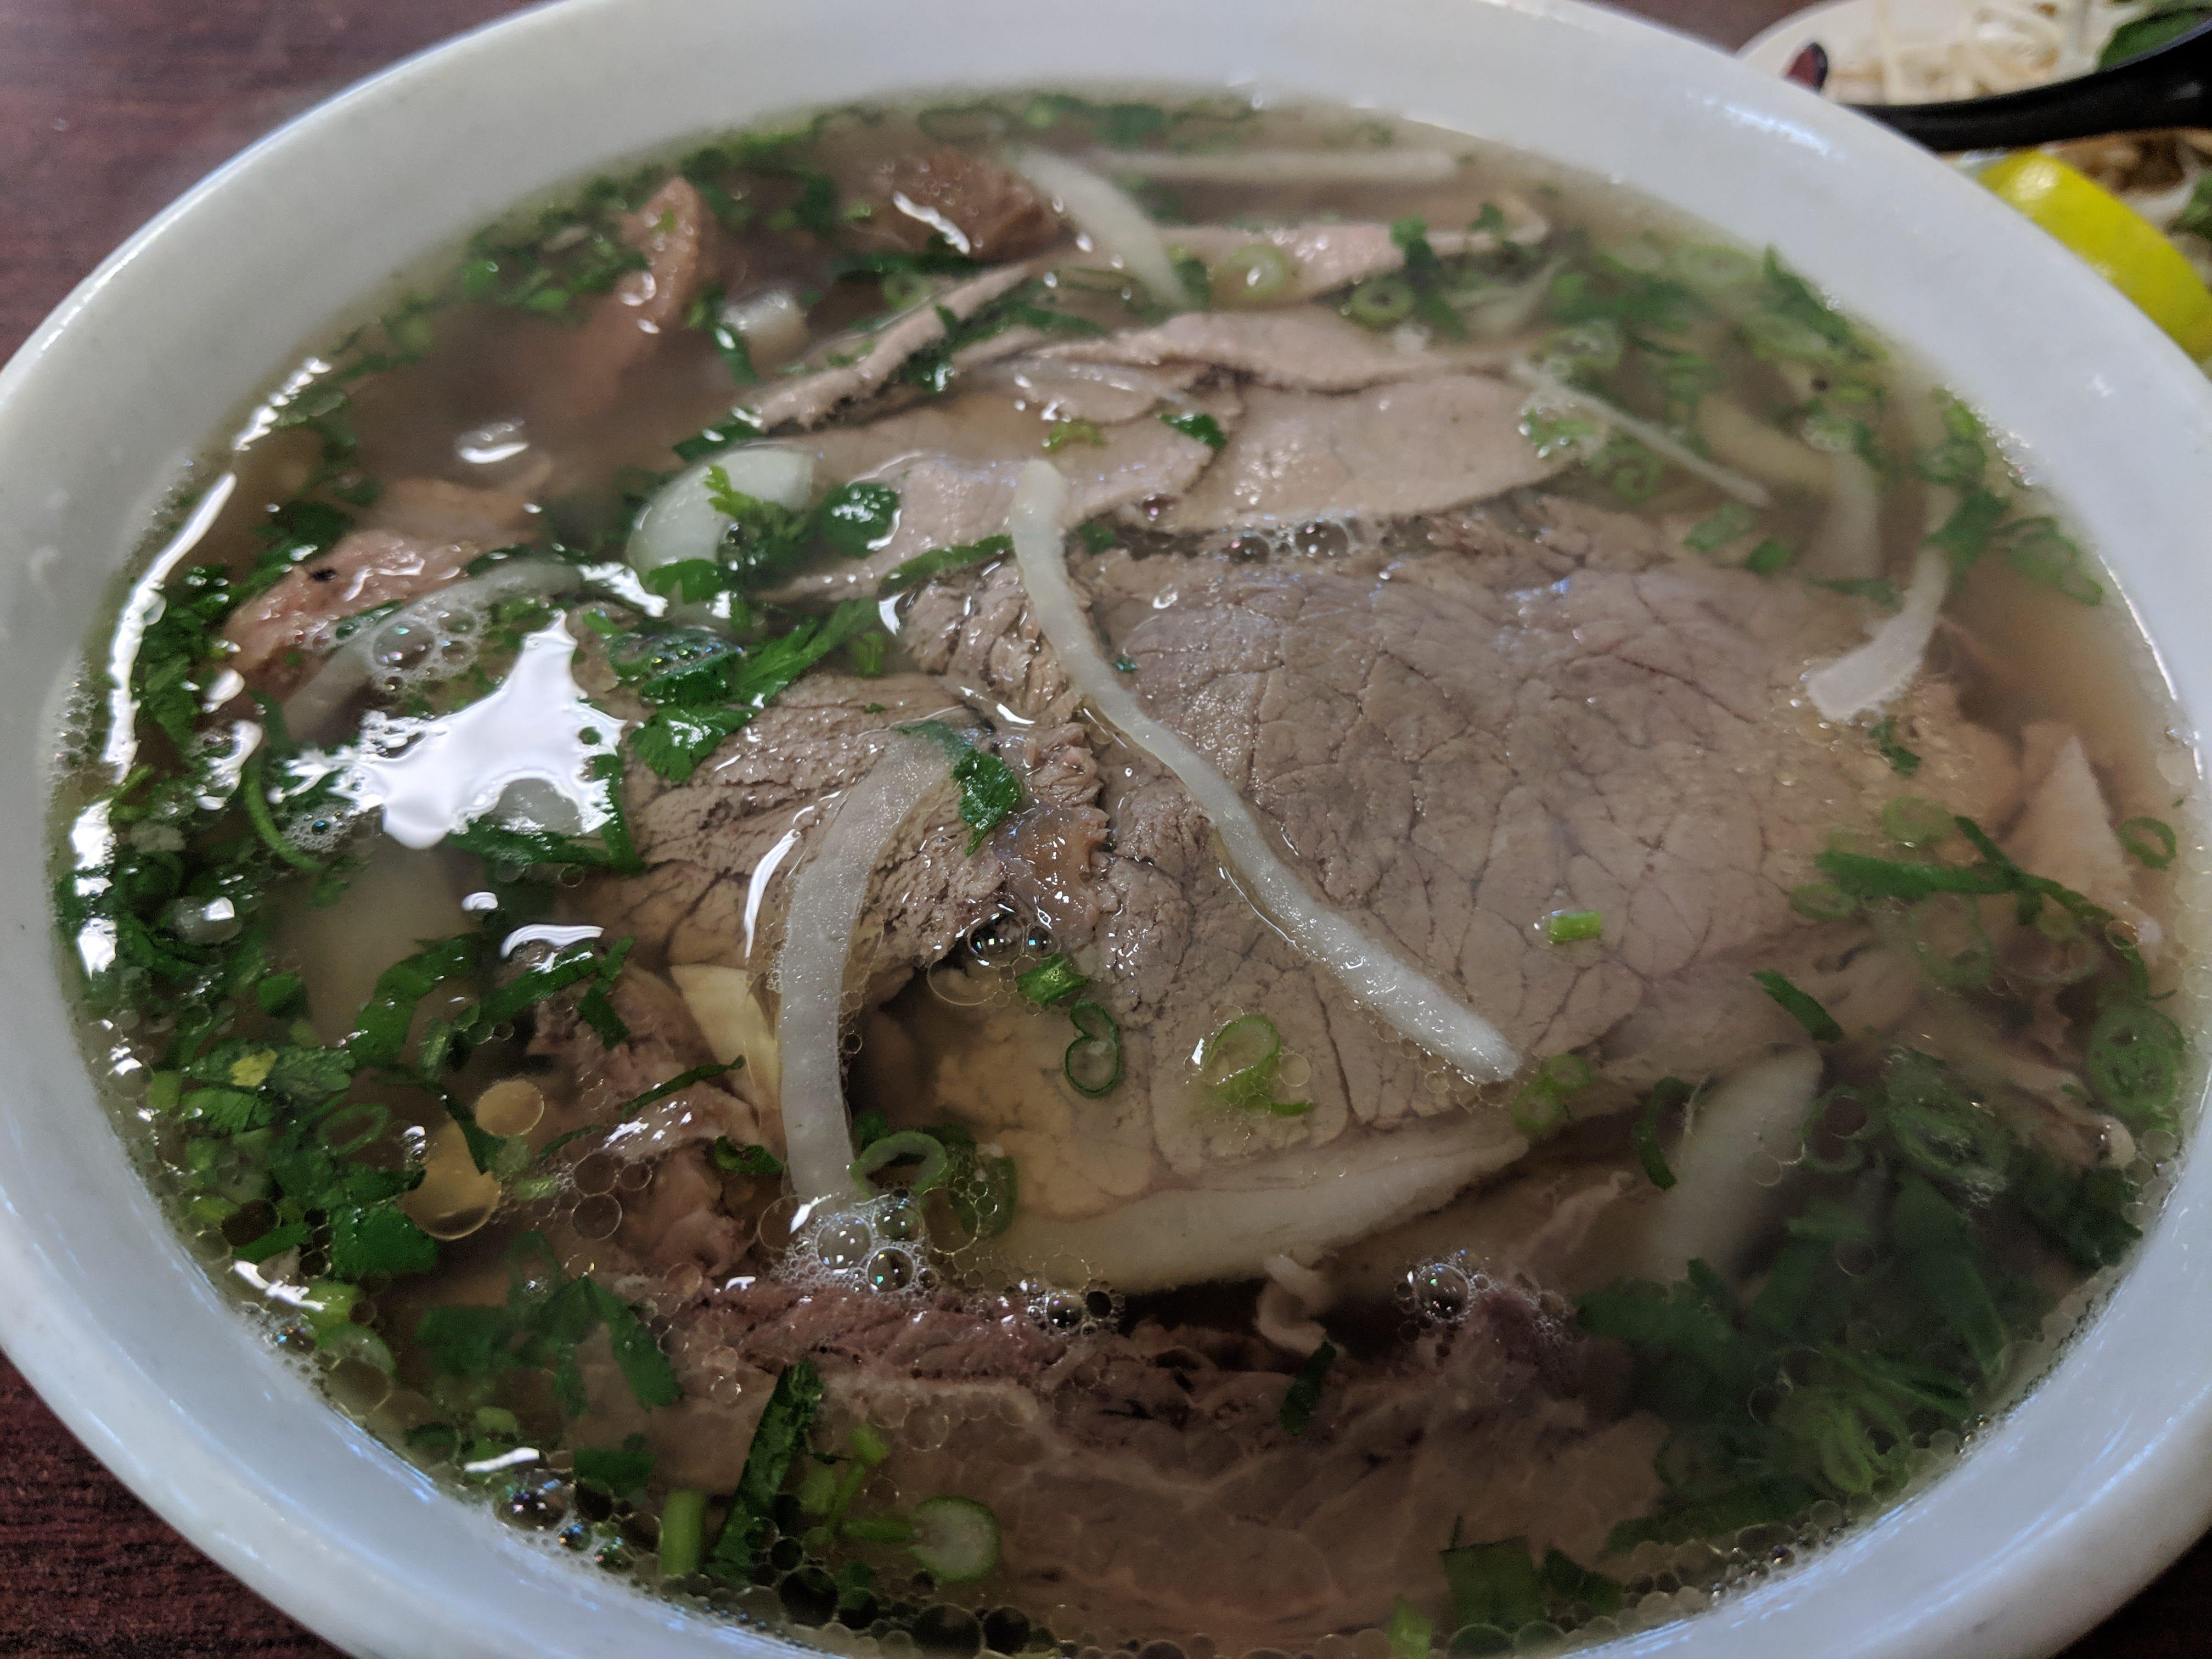 The Pho Dac Biet (combination noodle soup) at I Love Pho.